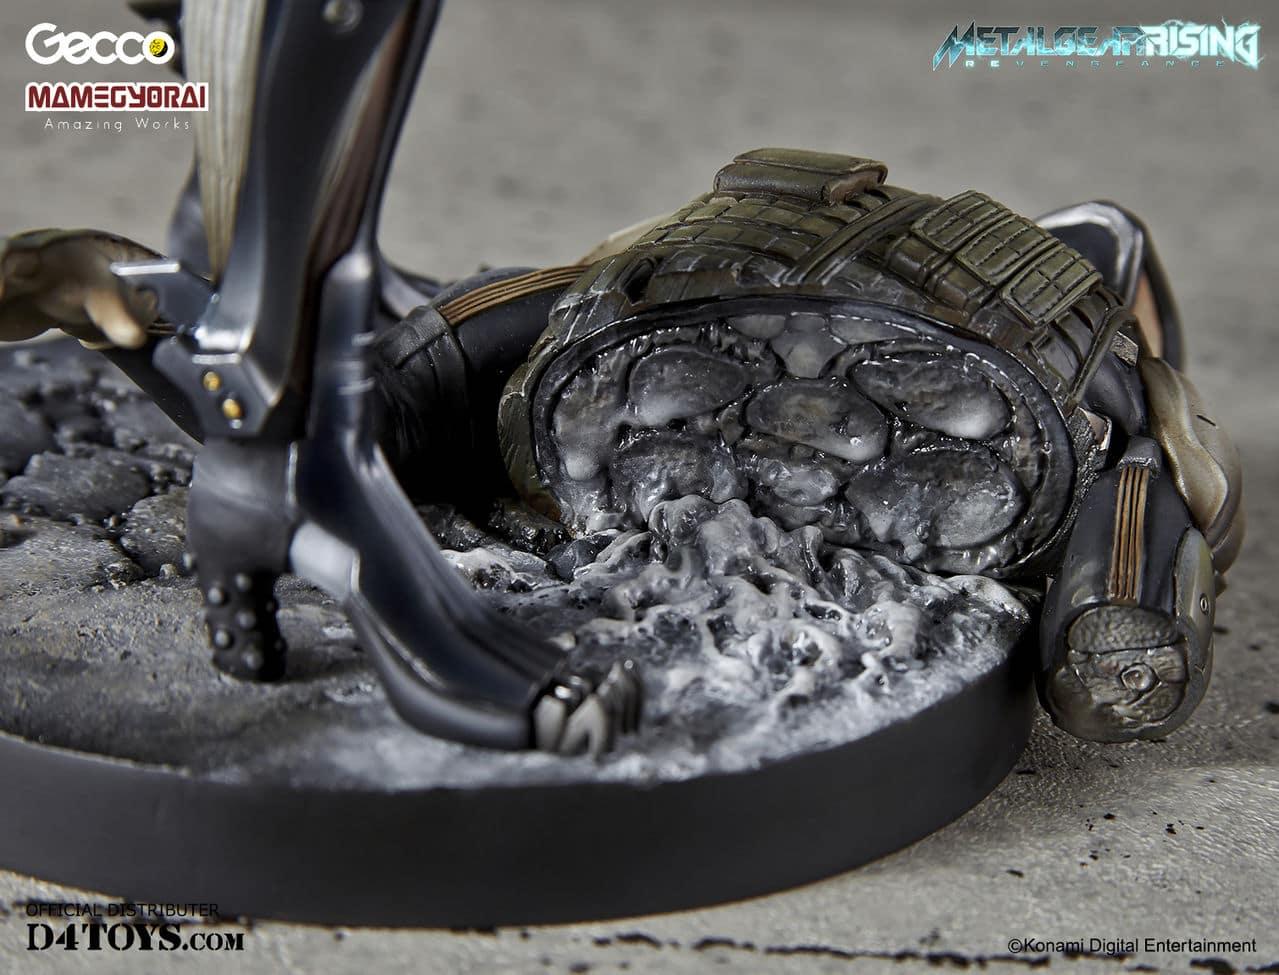 [Gecco,  Mamegyorai] Metal Gear Rising: Revengeance - RAIDEN White Armor 1/6 - SDCC2015 Exclusive - Página 2 D4_d05